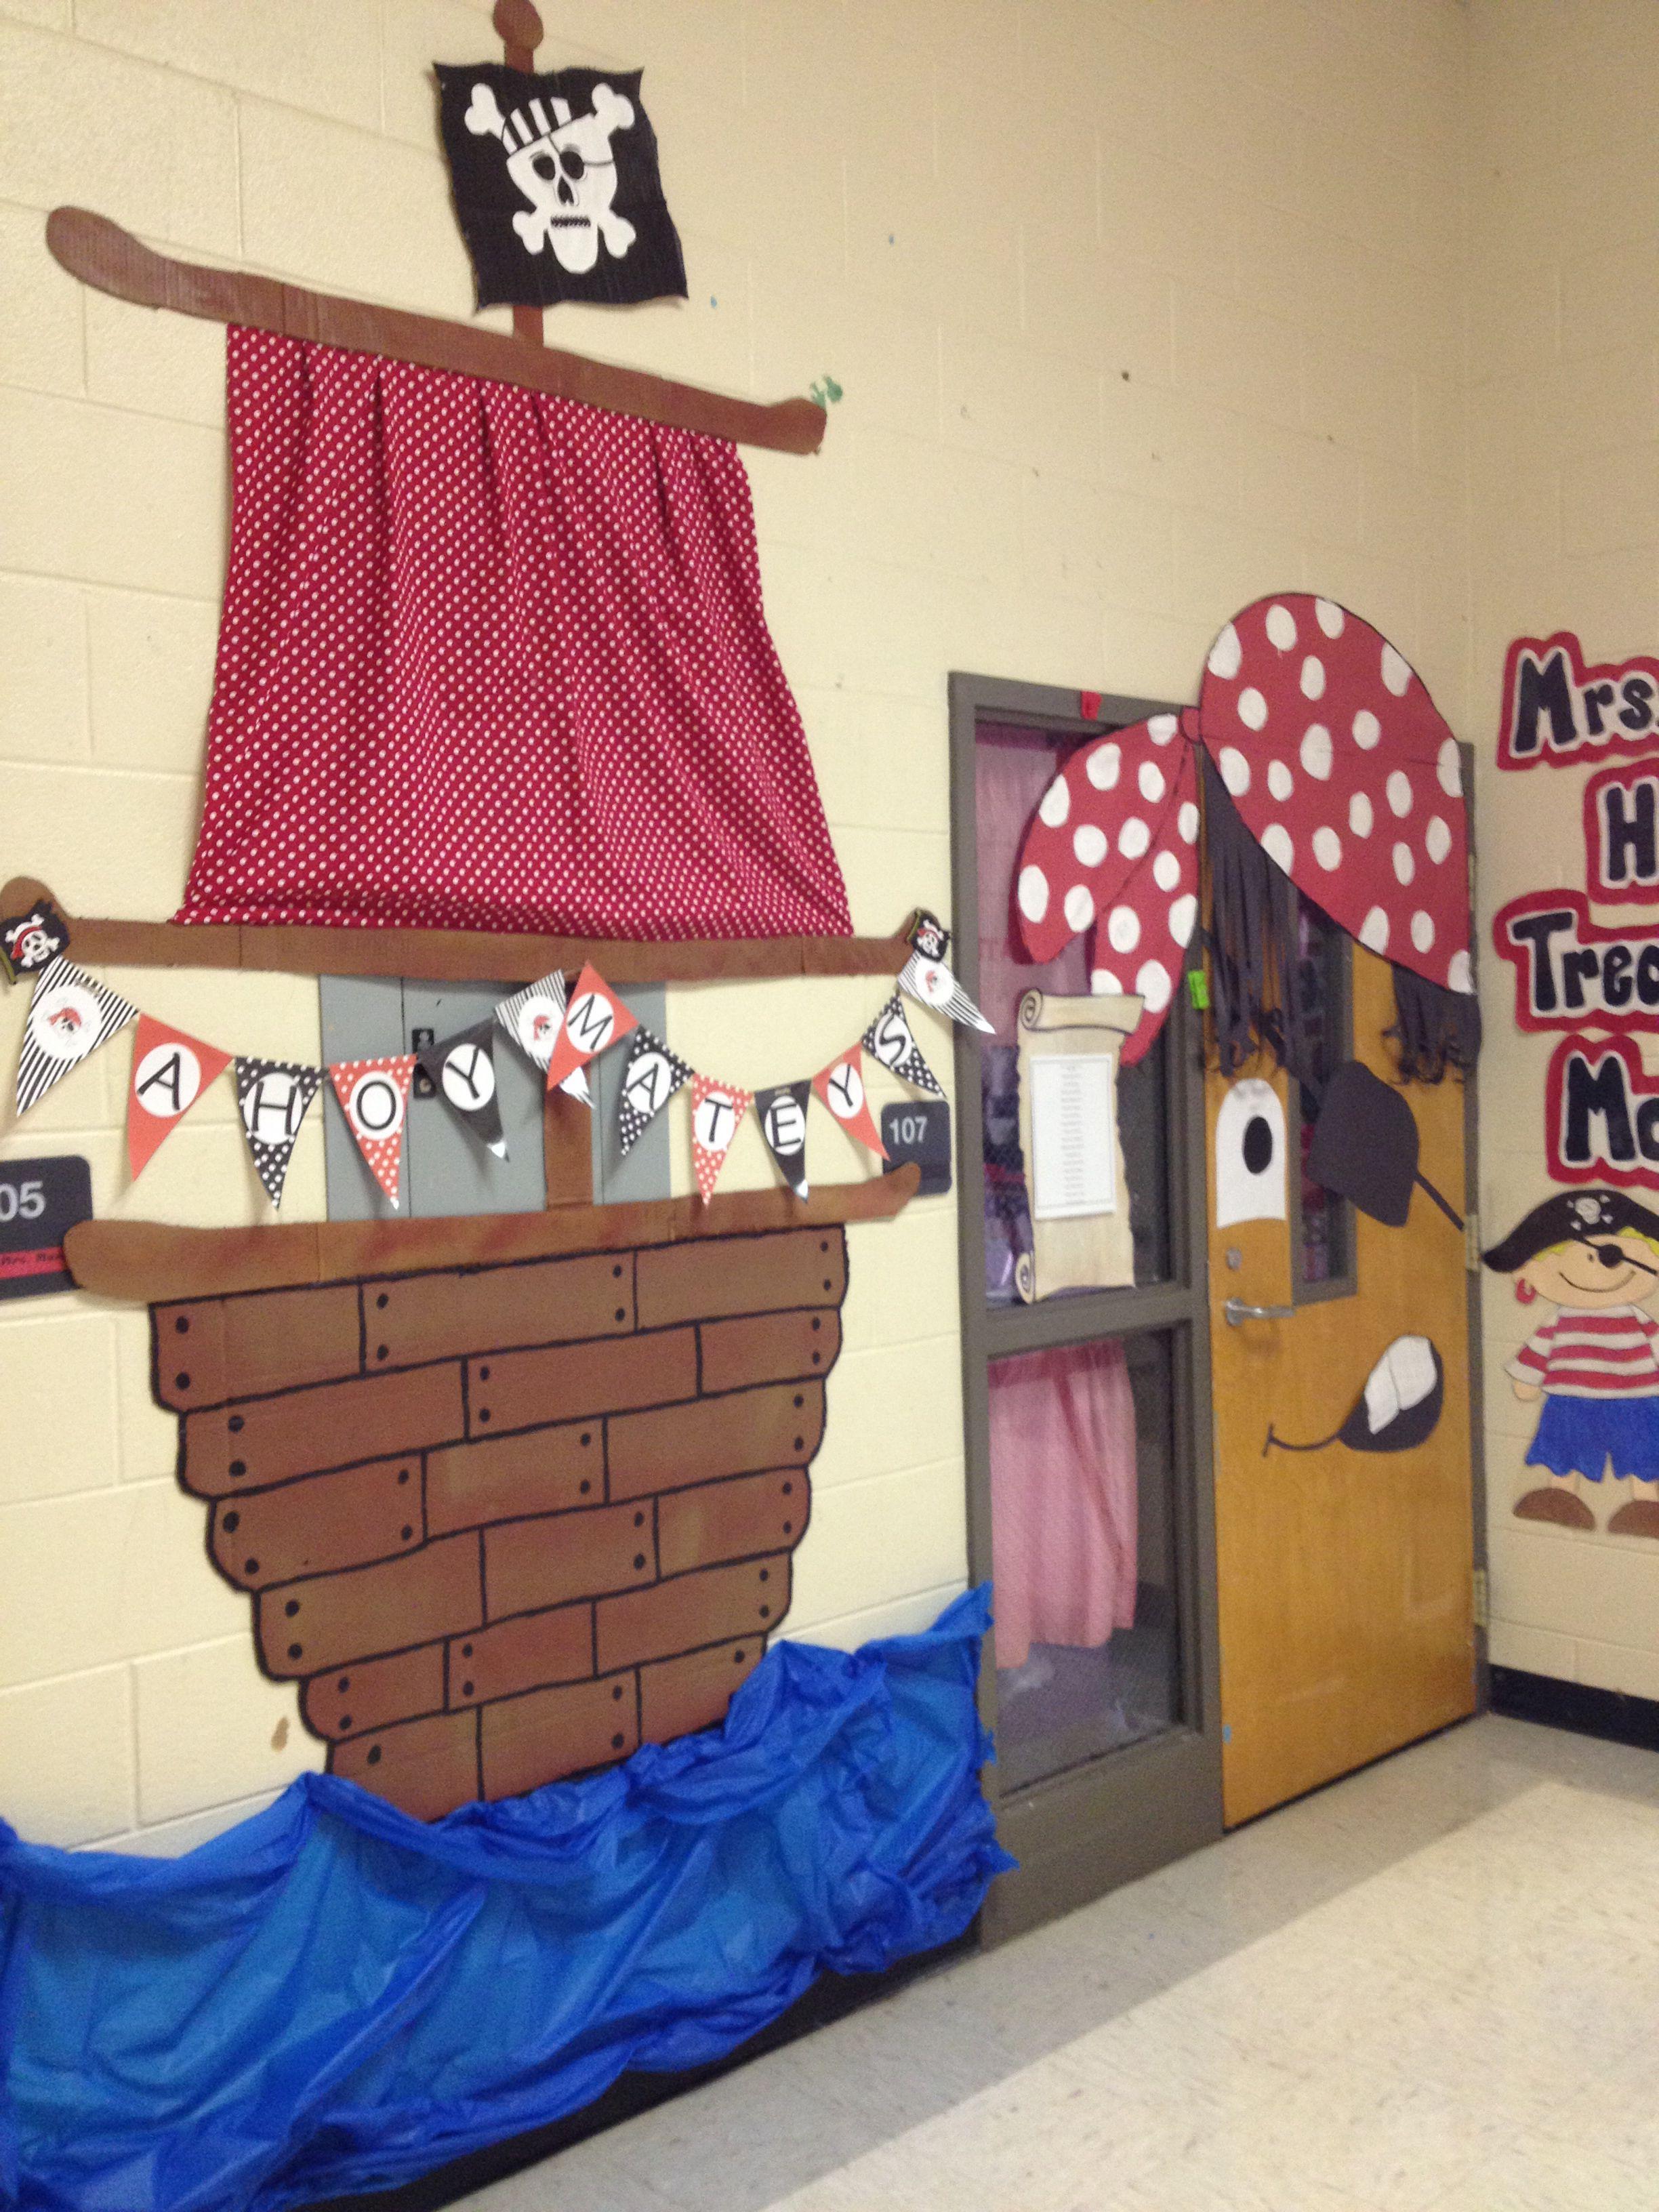 Pirate Ship Hall Decor